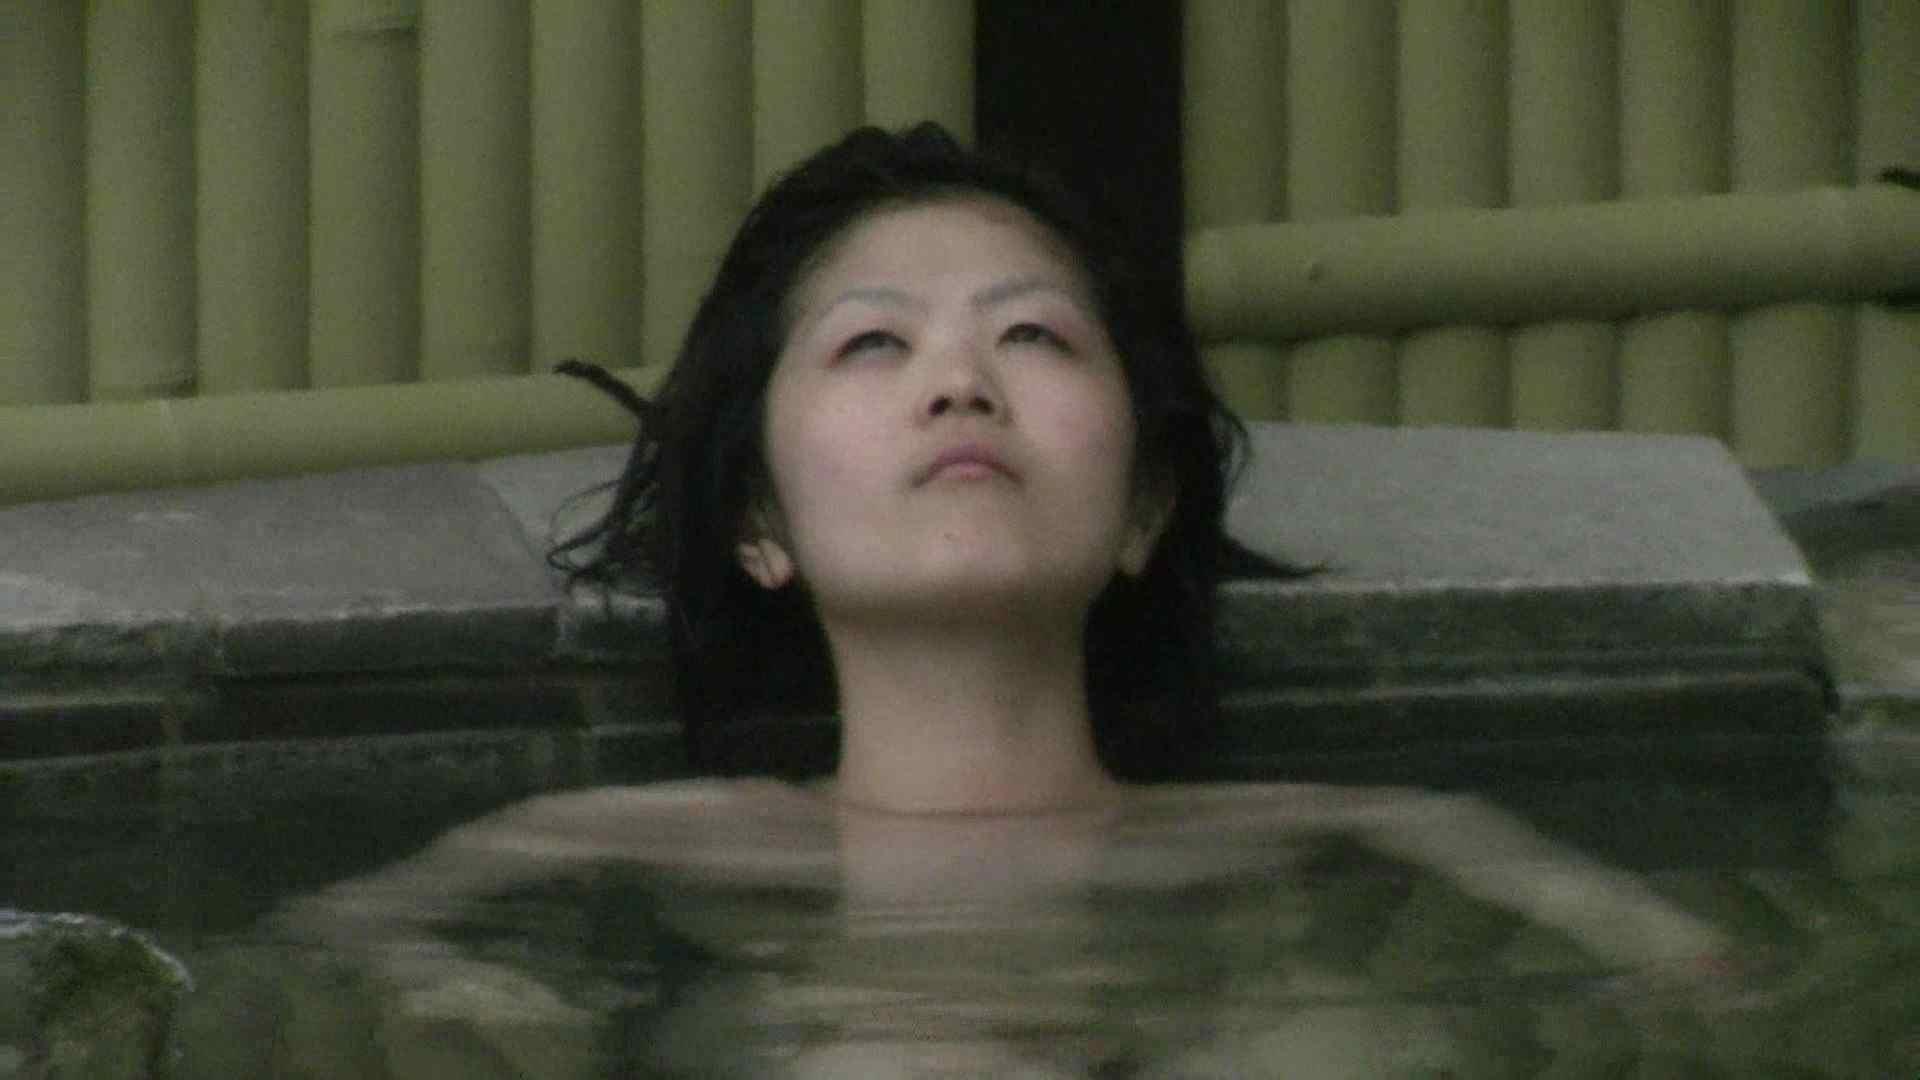 Aquaな露天風呂Vol.538 盗撮師作品 おめこ無修正動画無料 82pic 14